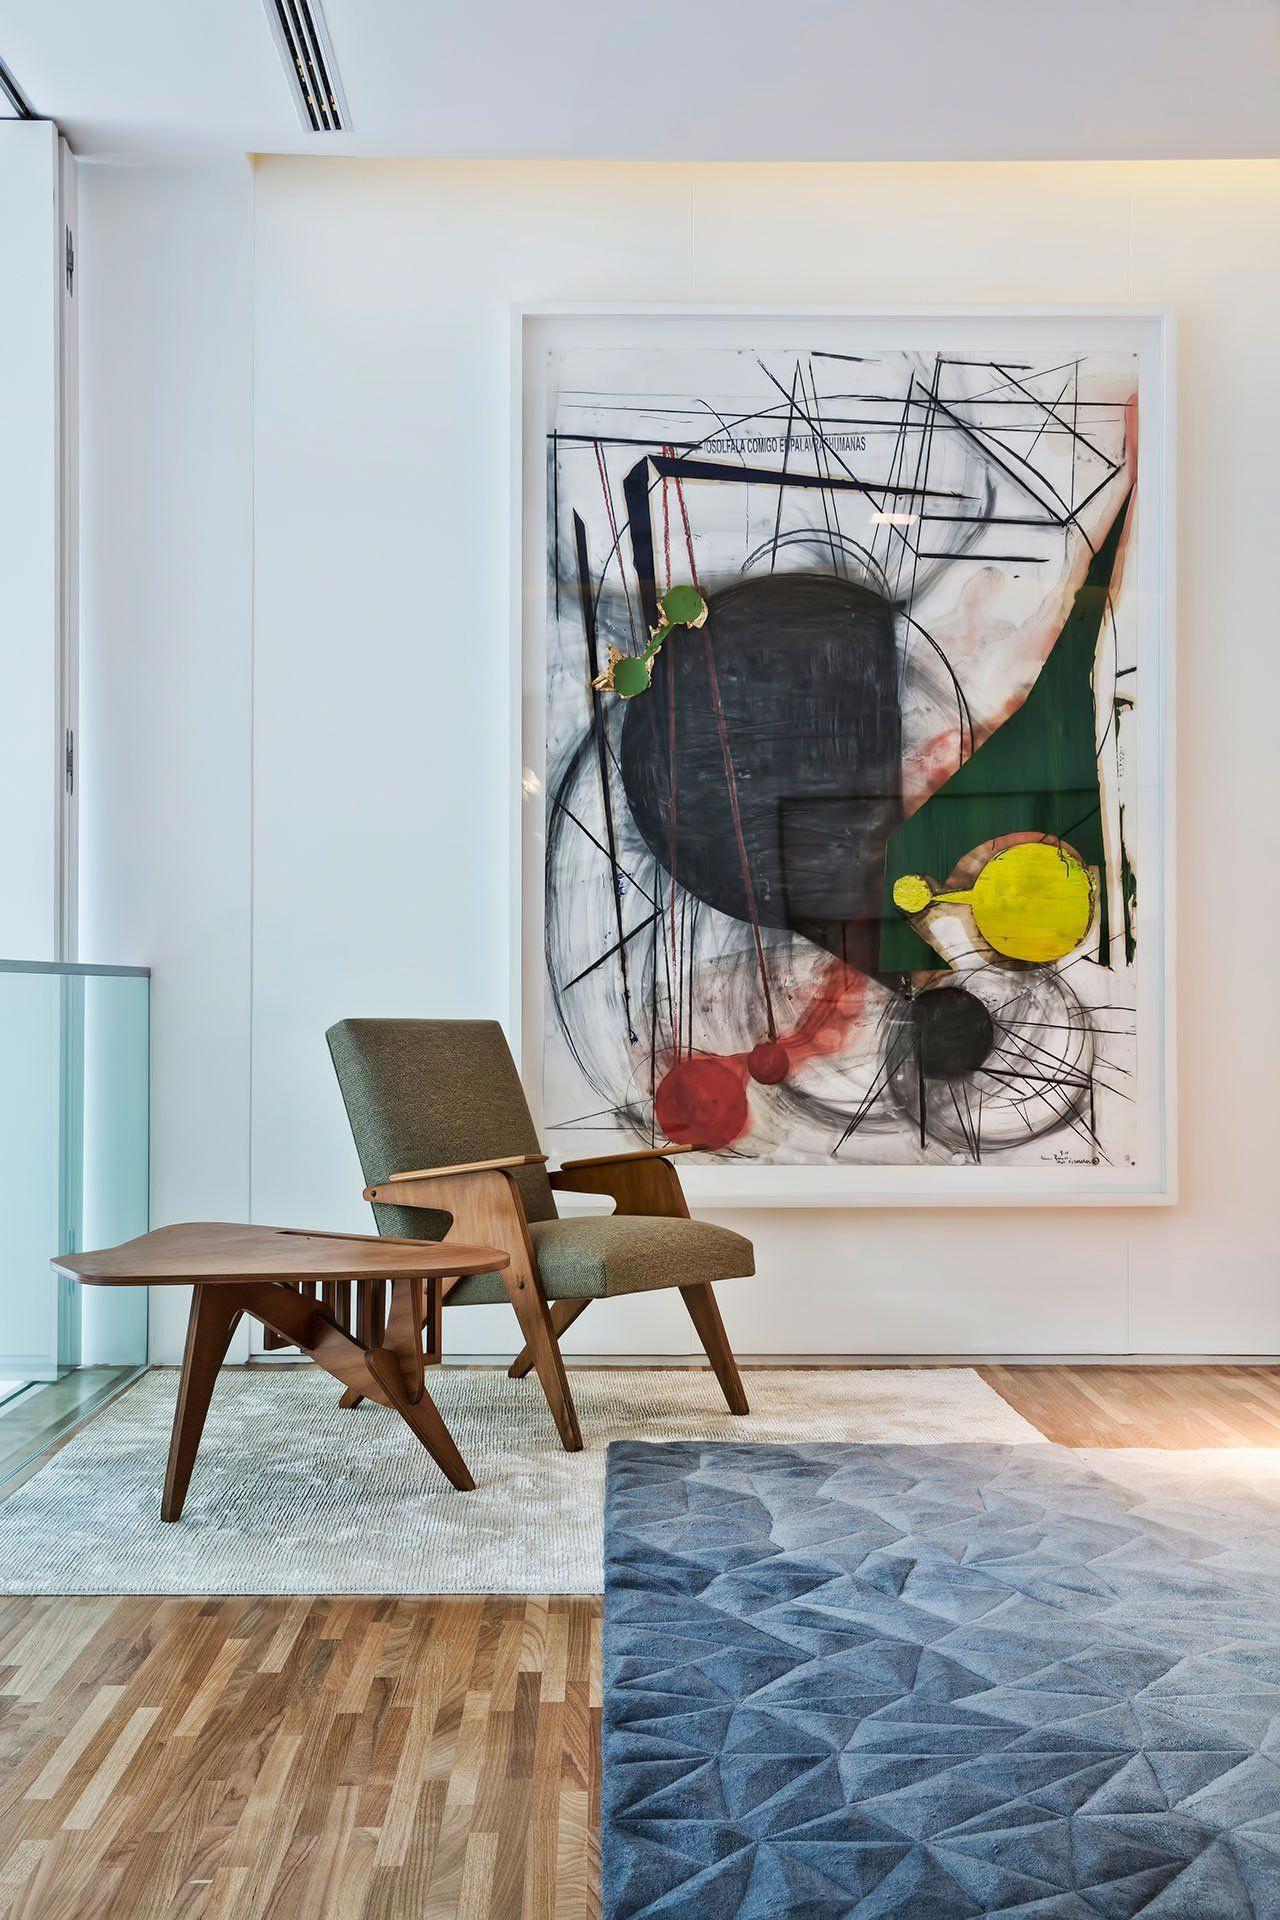 Home front bekommen design photo fillippo bamberghi  sweet home make  interior decoration